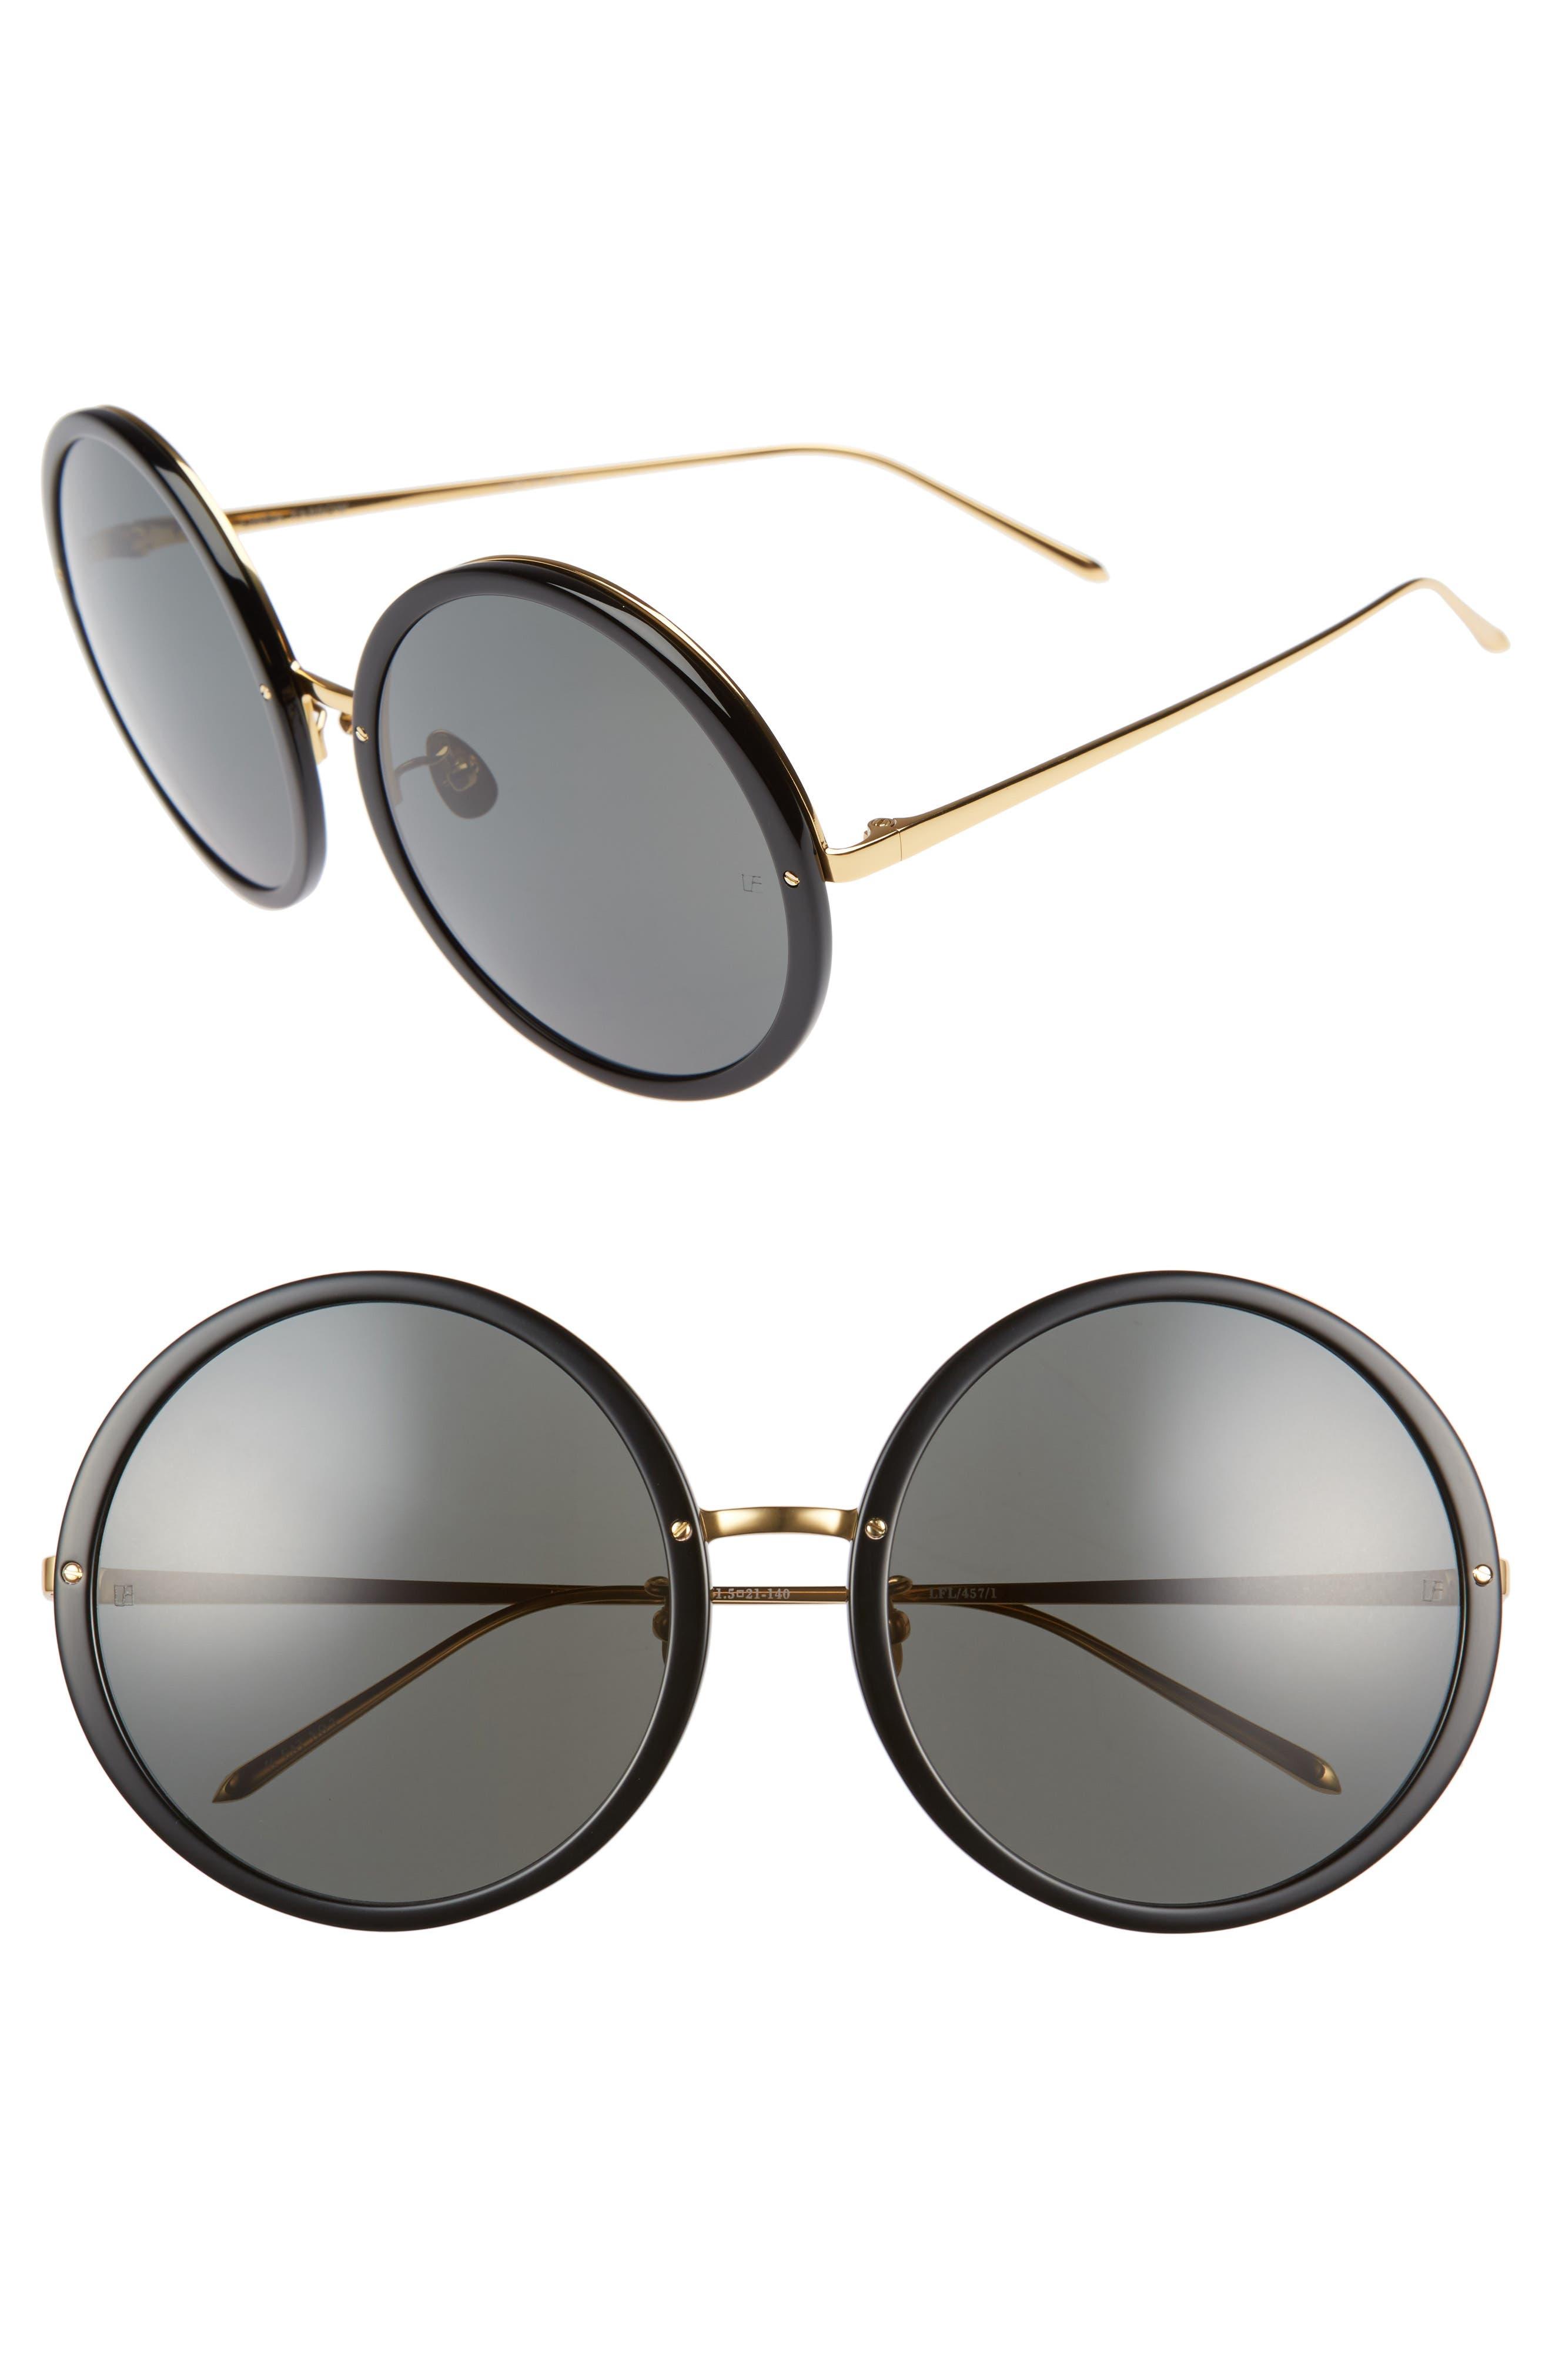 61mm Round 18 Karat Gold Trim Sunglasses,                             Main thumbnail 1, color,                             BLACK/ YELLOW GOLD/ GREY